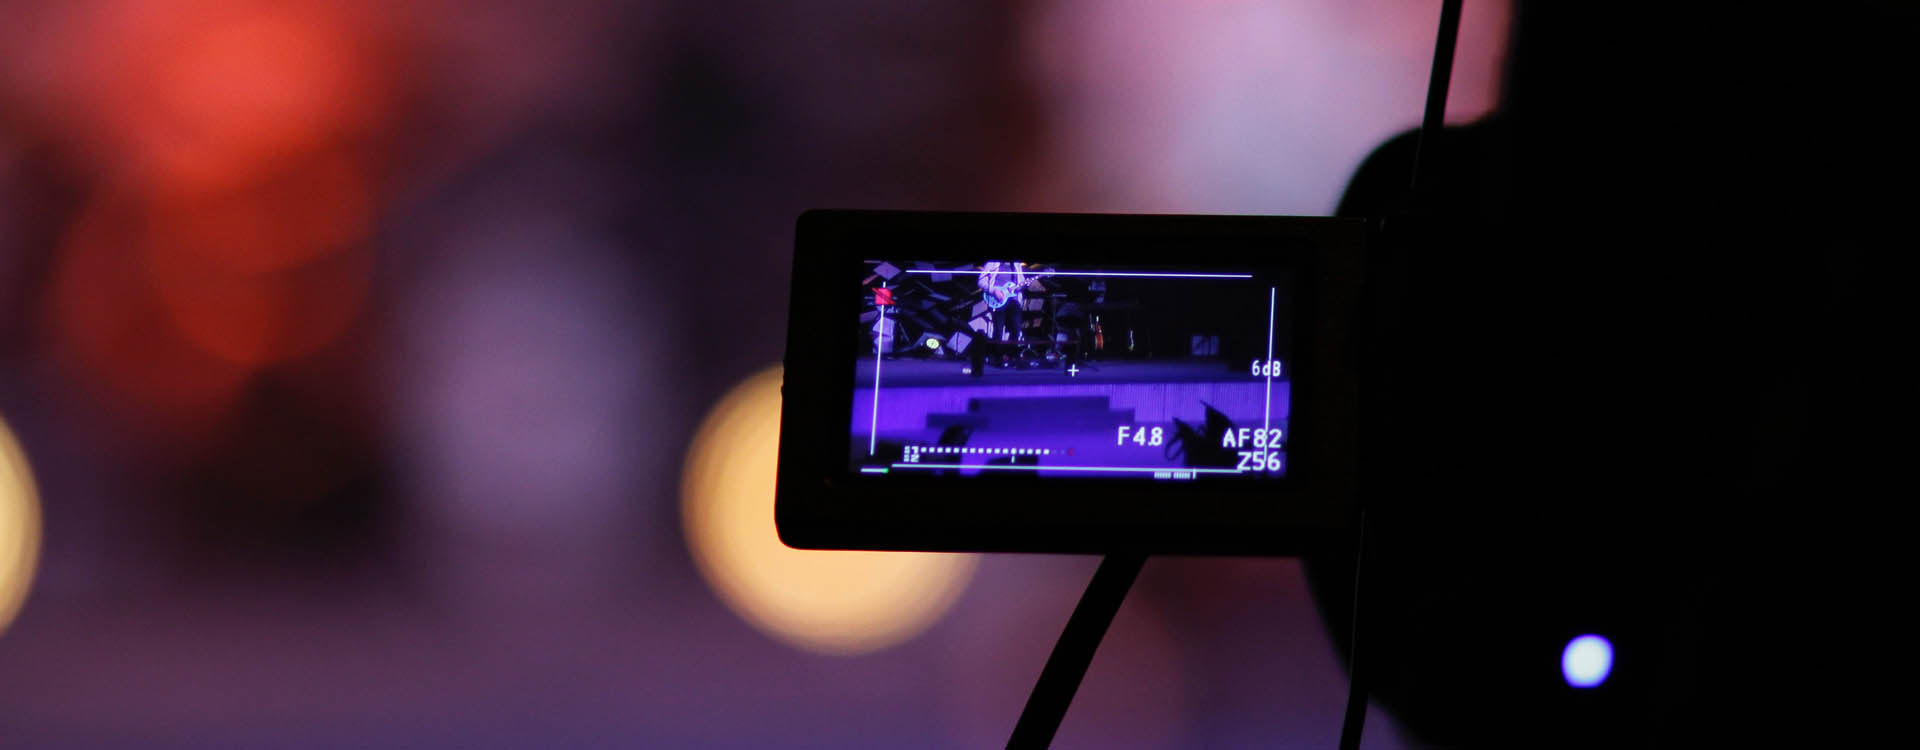 Videos -  Wfg aktuell